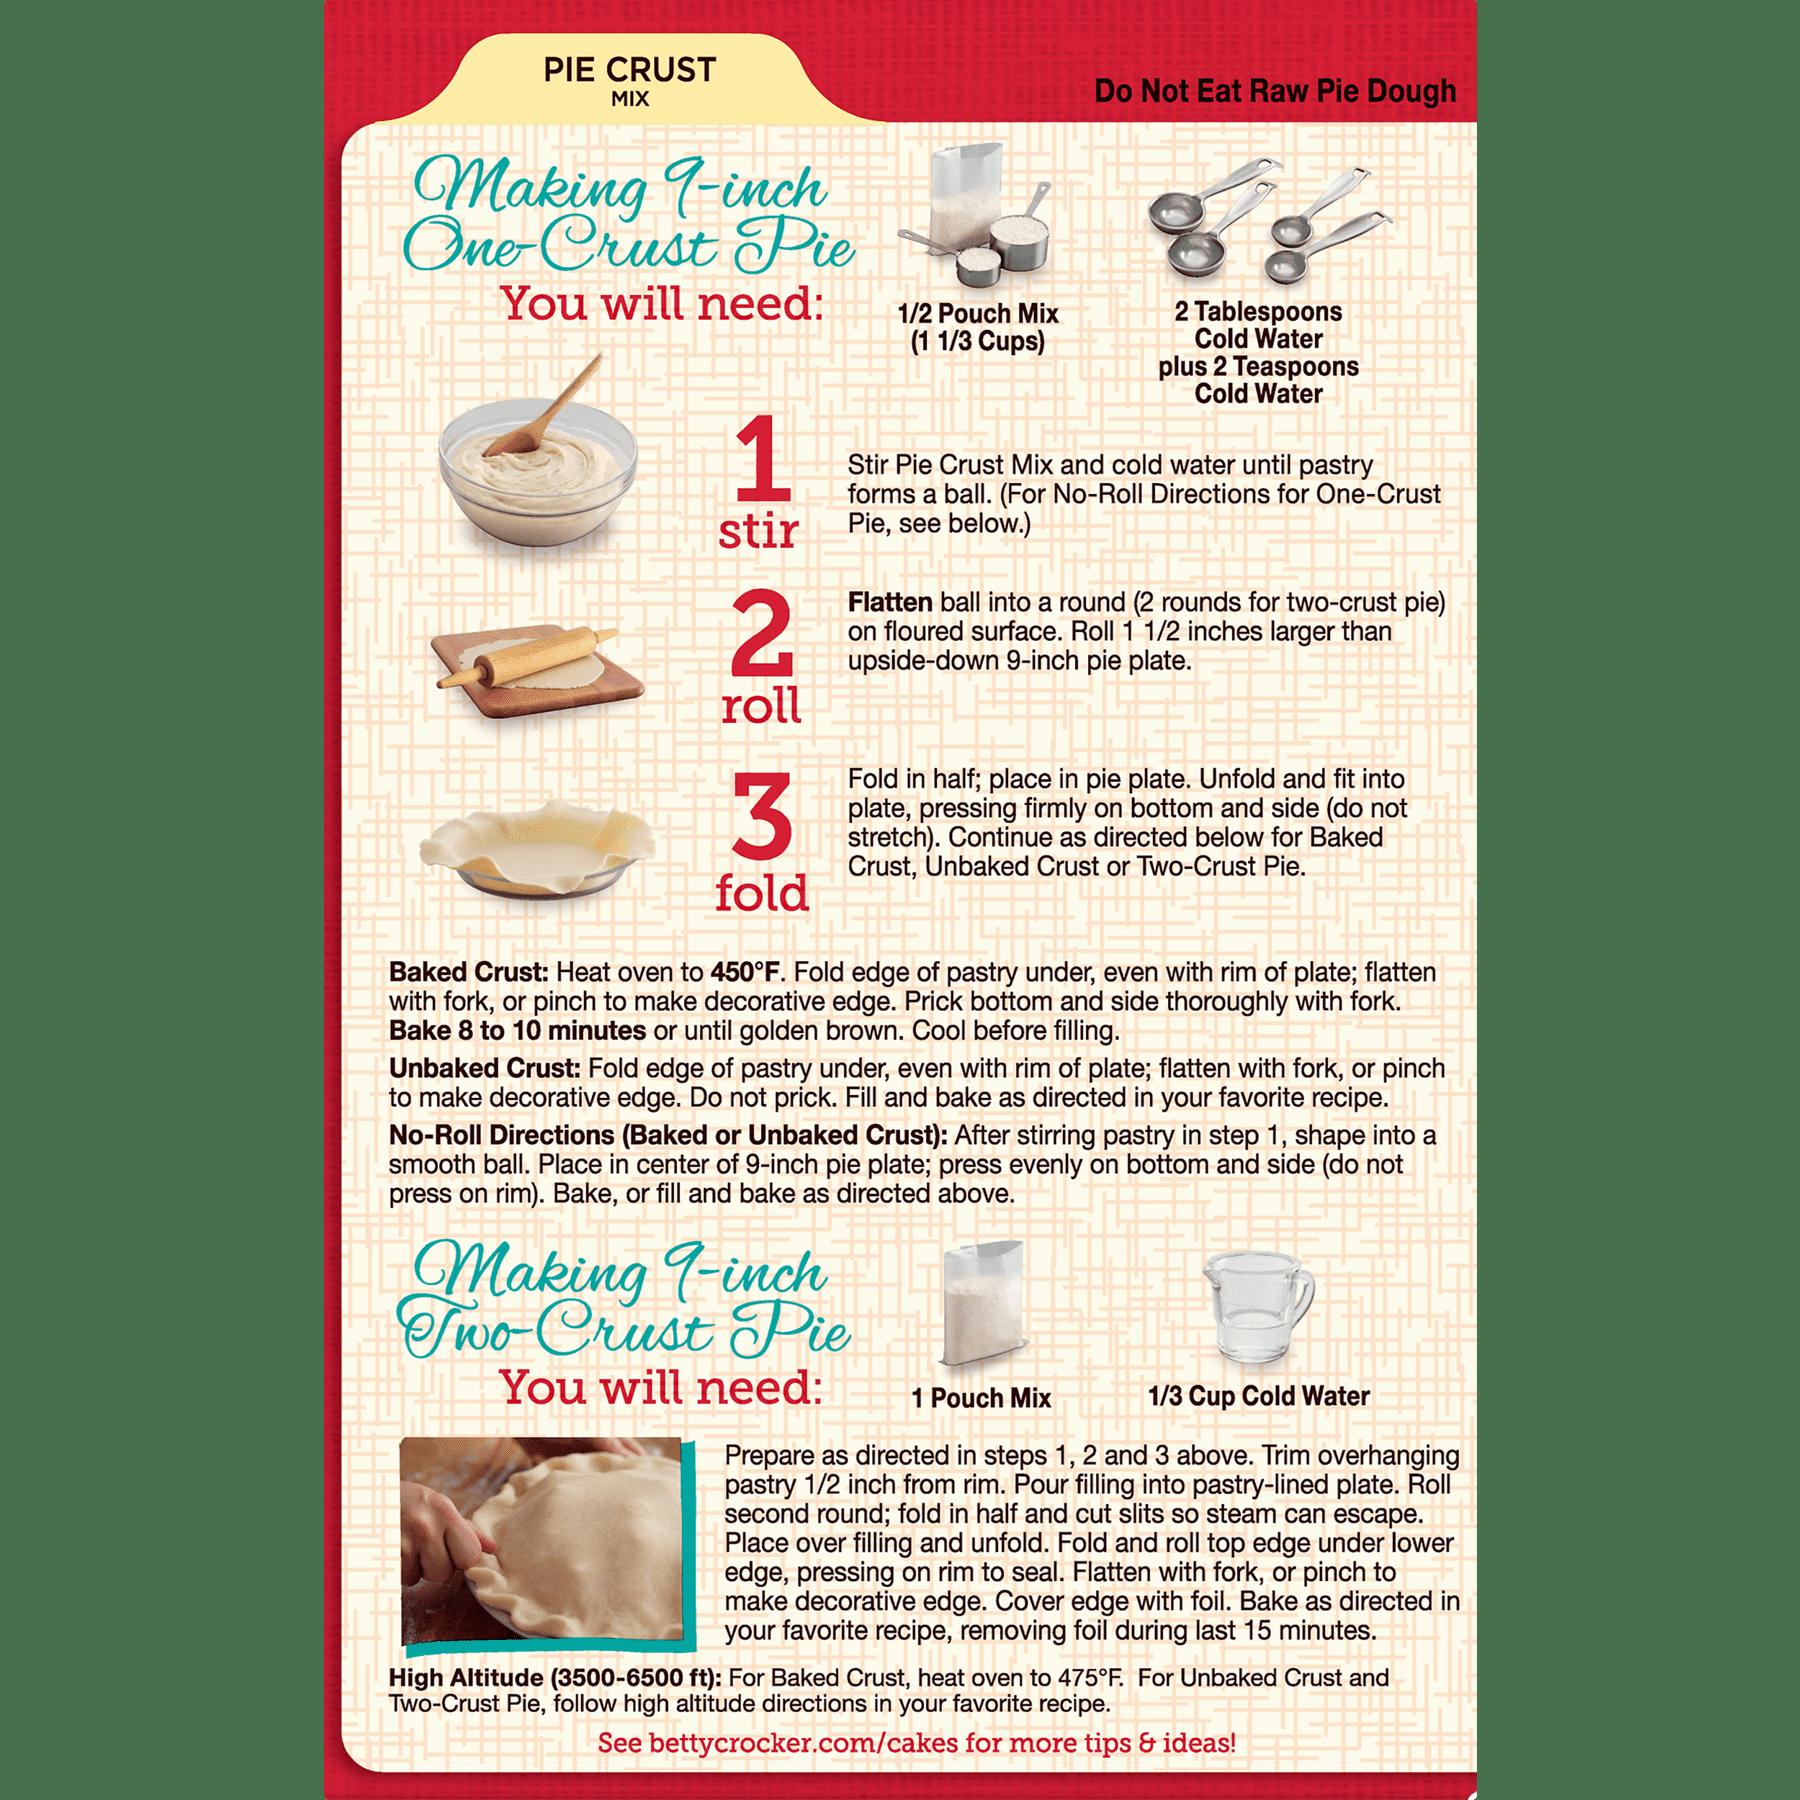 Betty Crocker Pie Crust Mix, 11 oz Box - Walmart.com